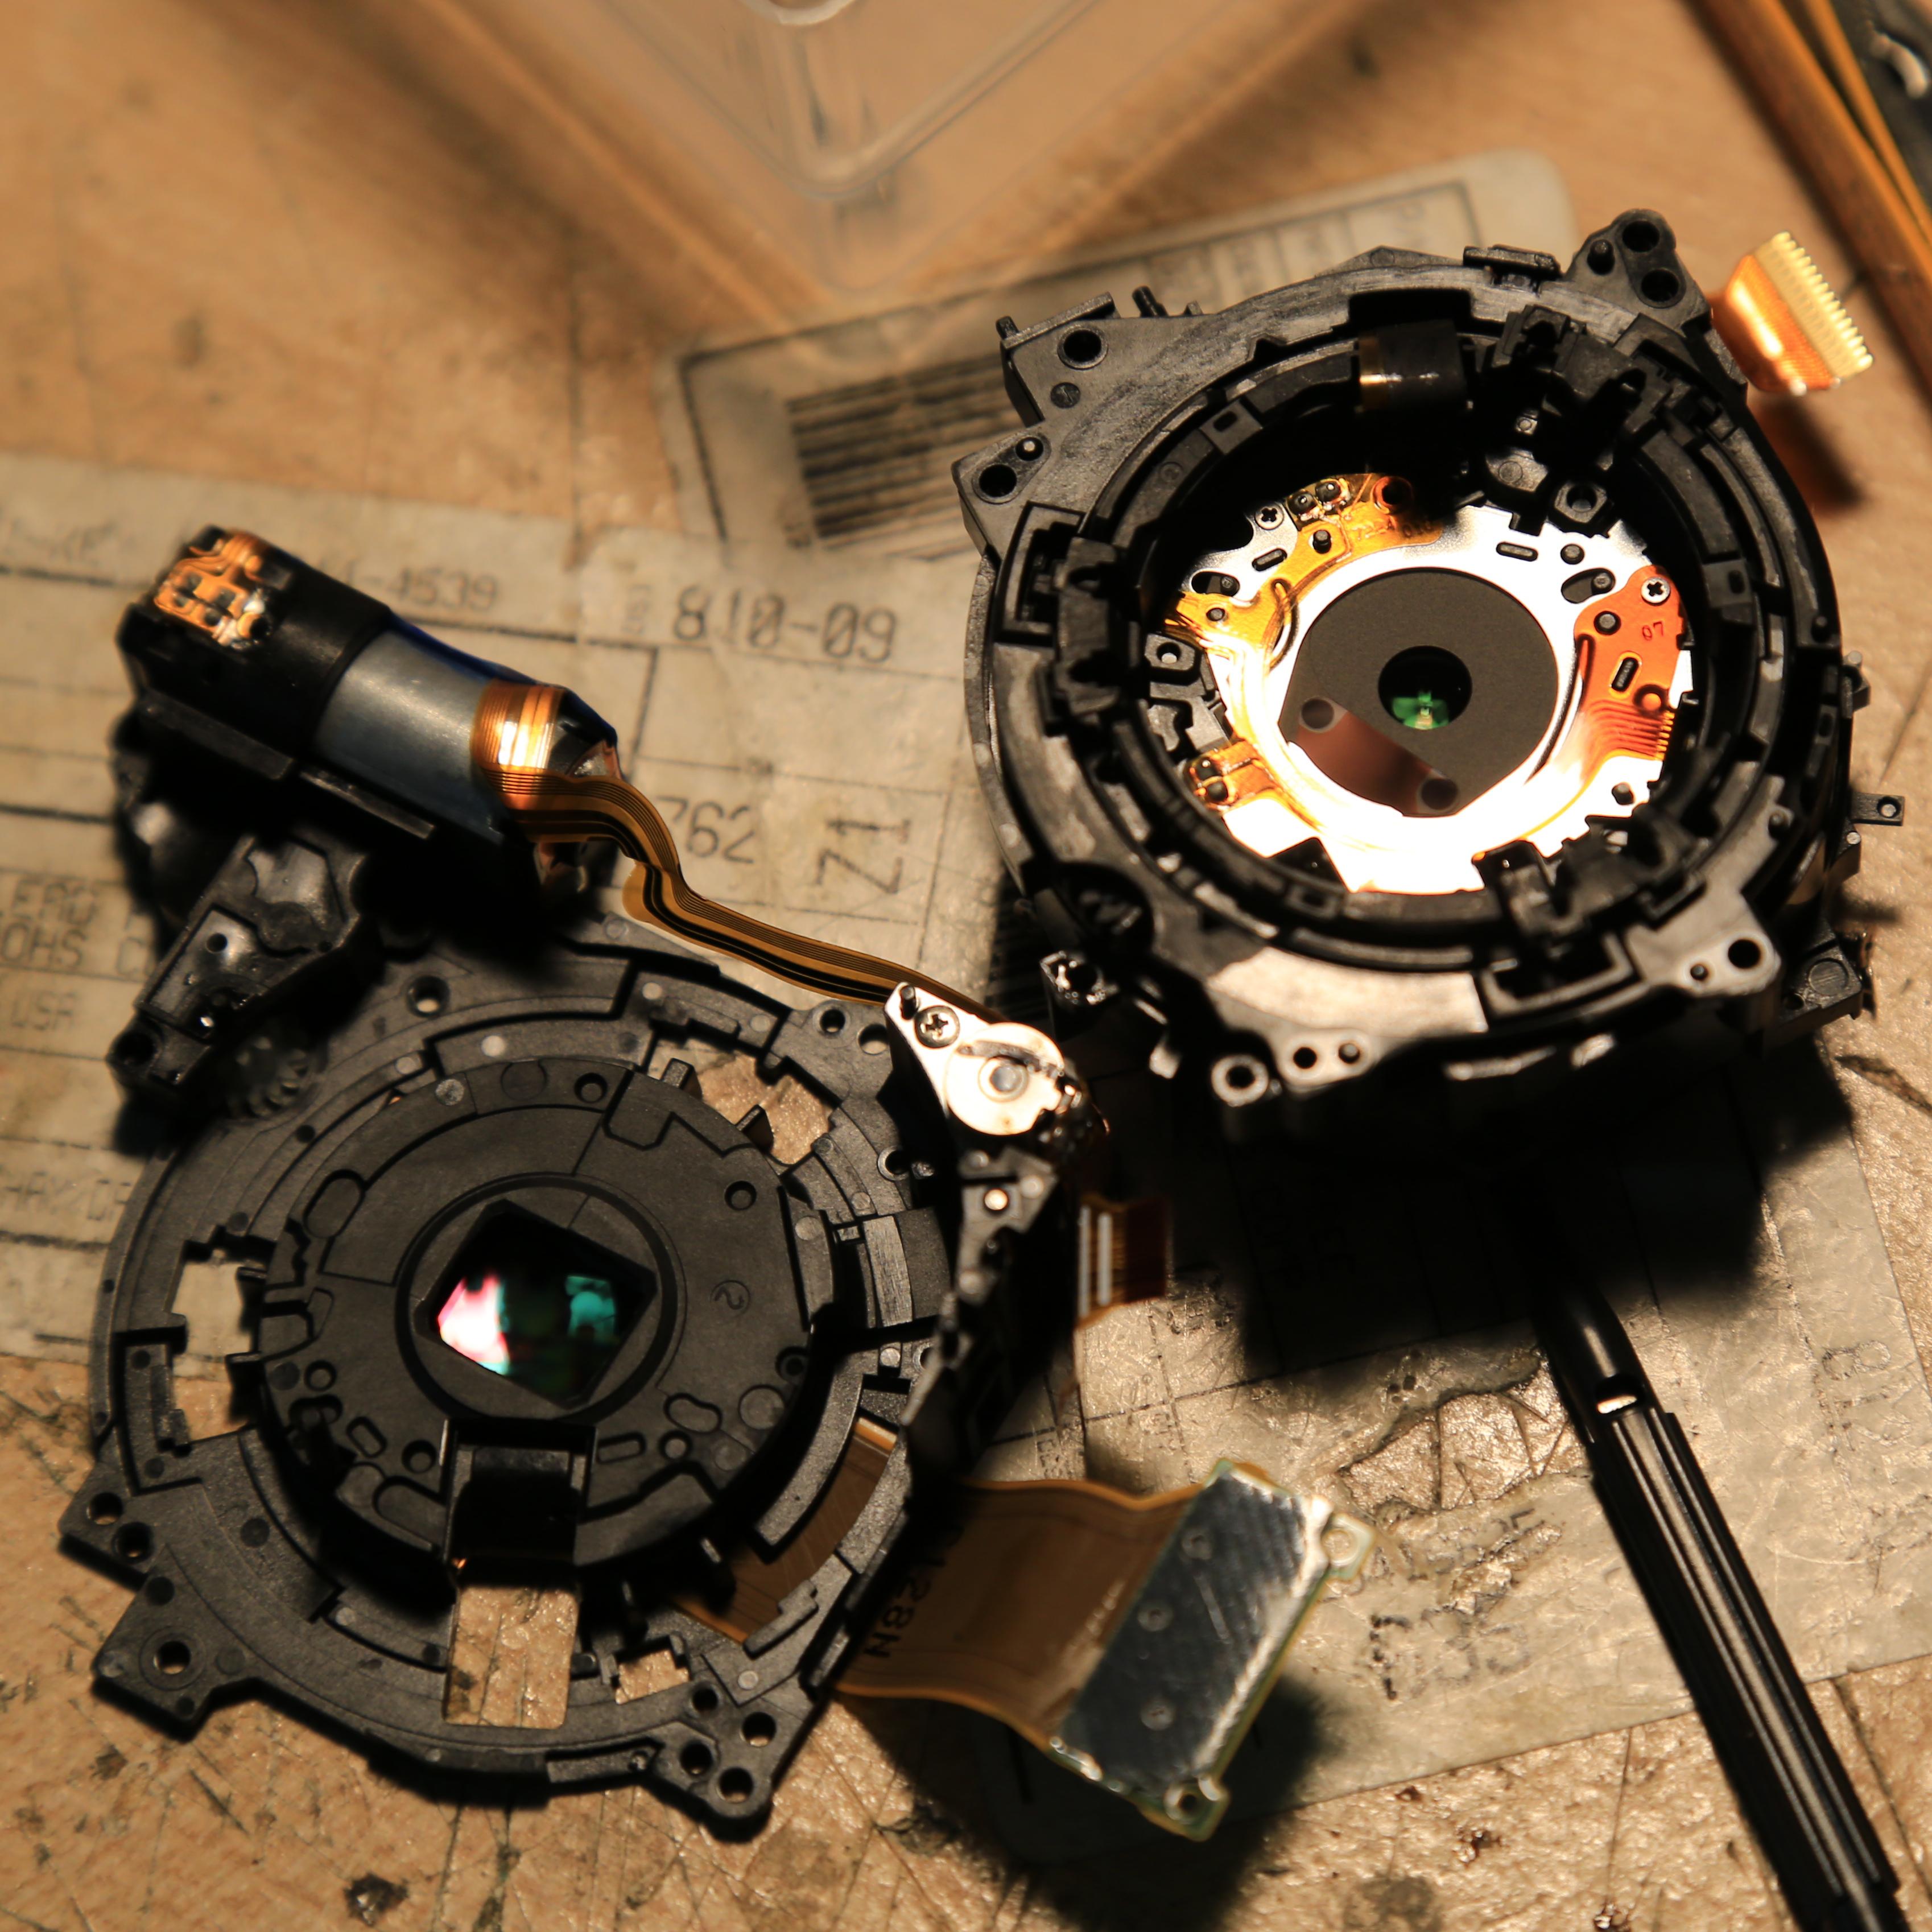 Canon PowerShot S110 repair attempt - VE7XEN's ham radio and ...